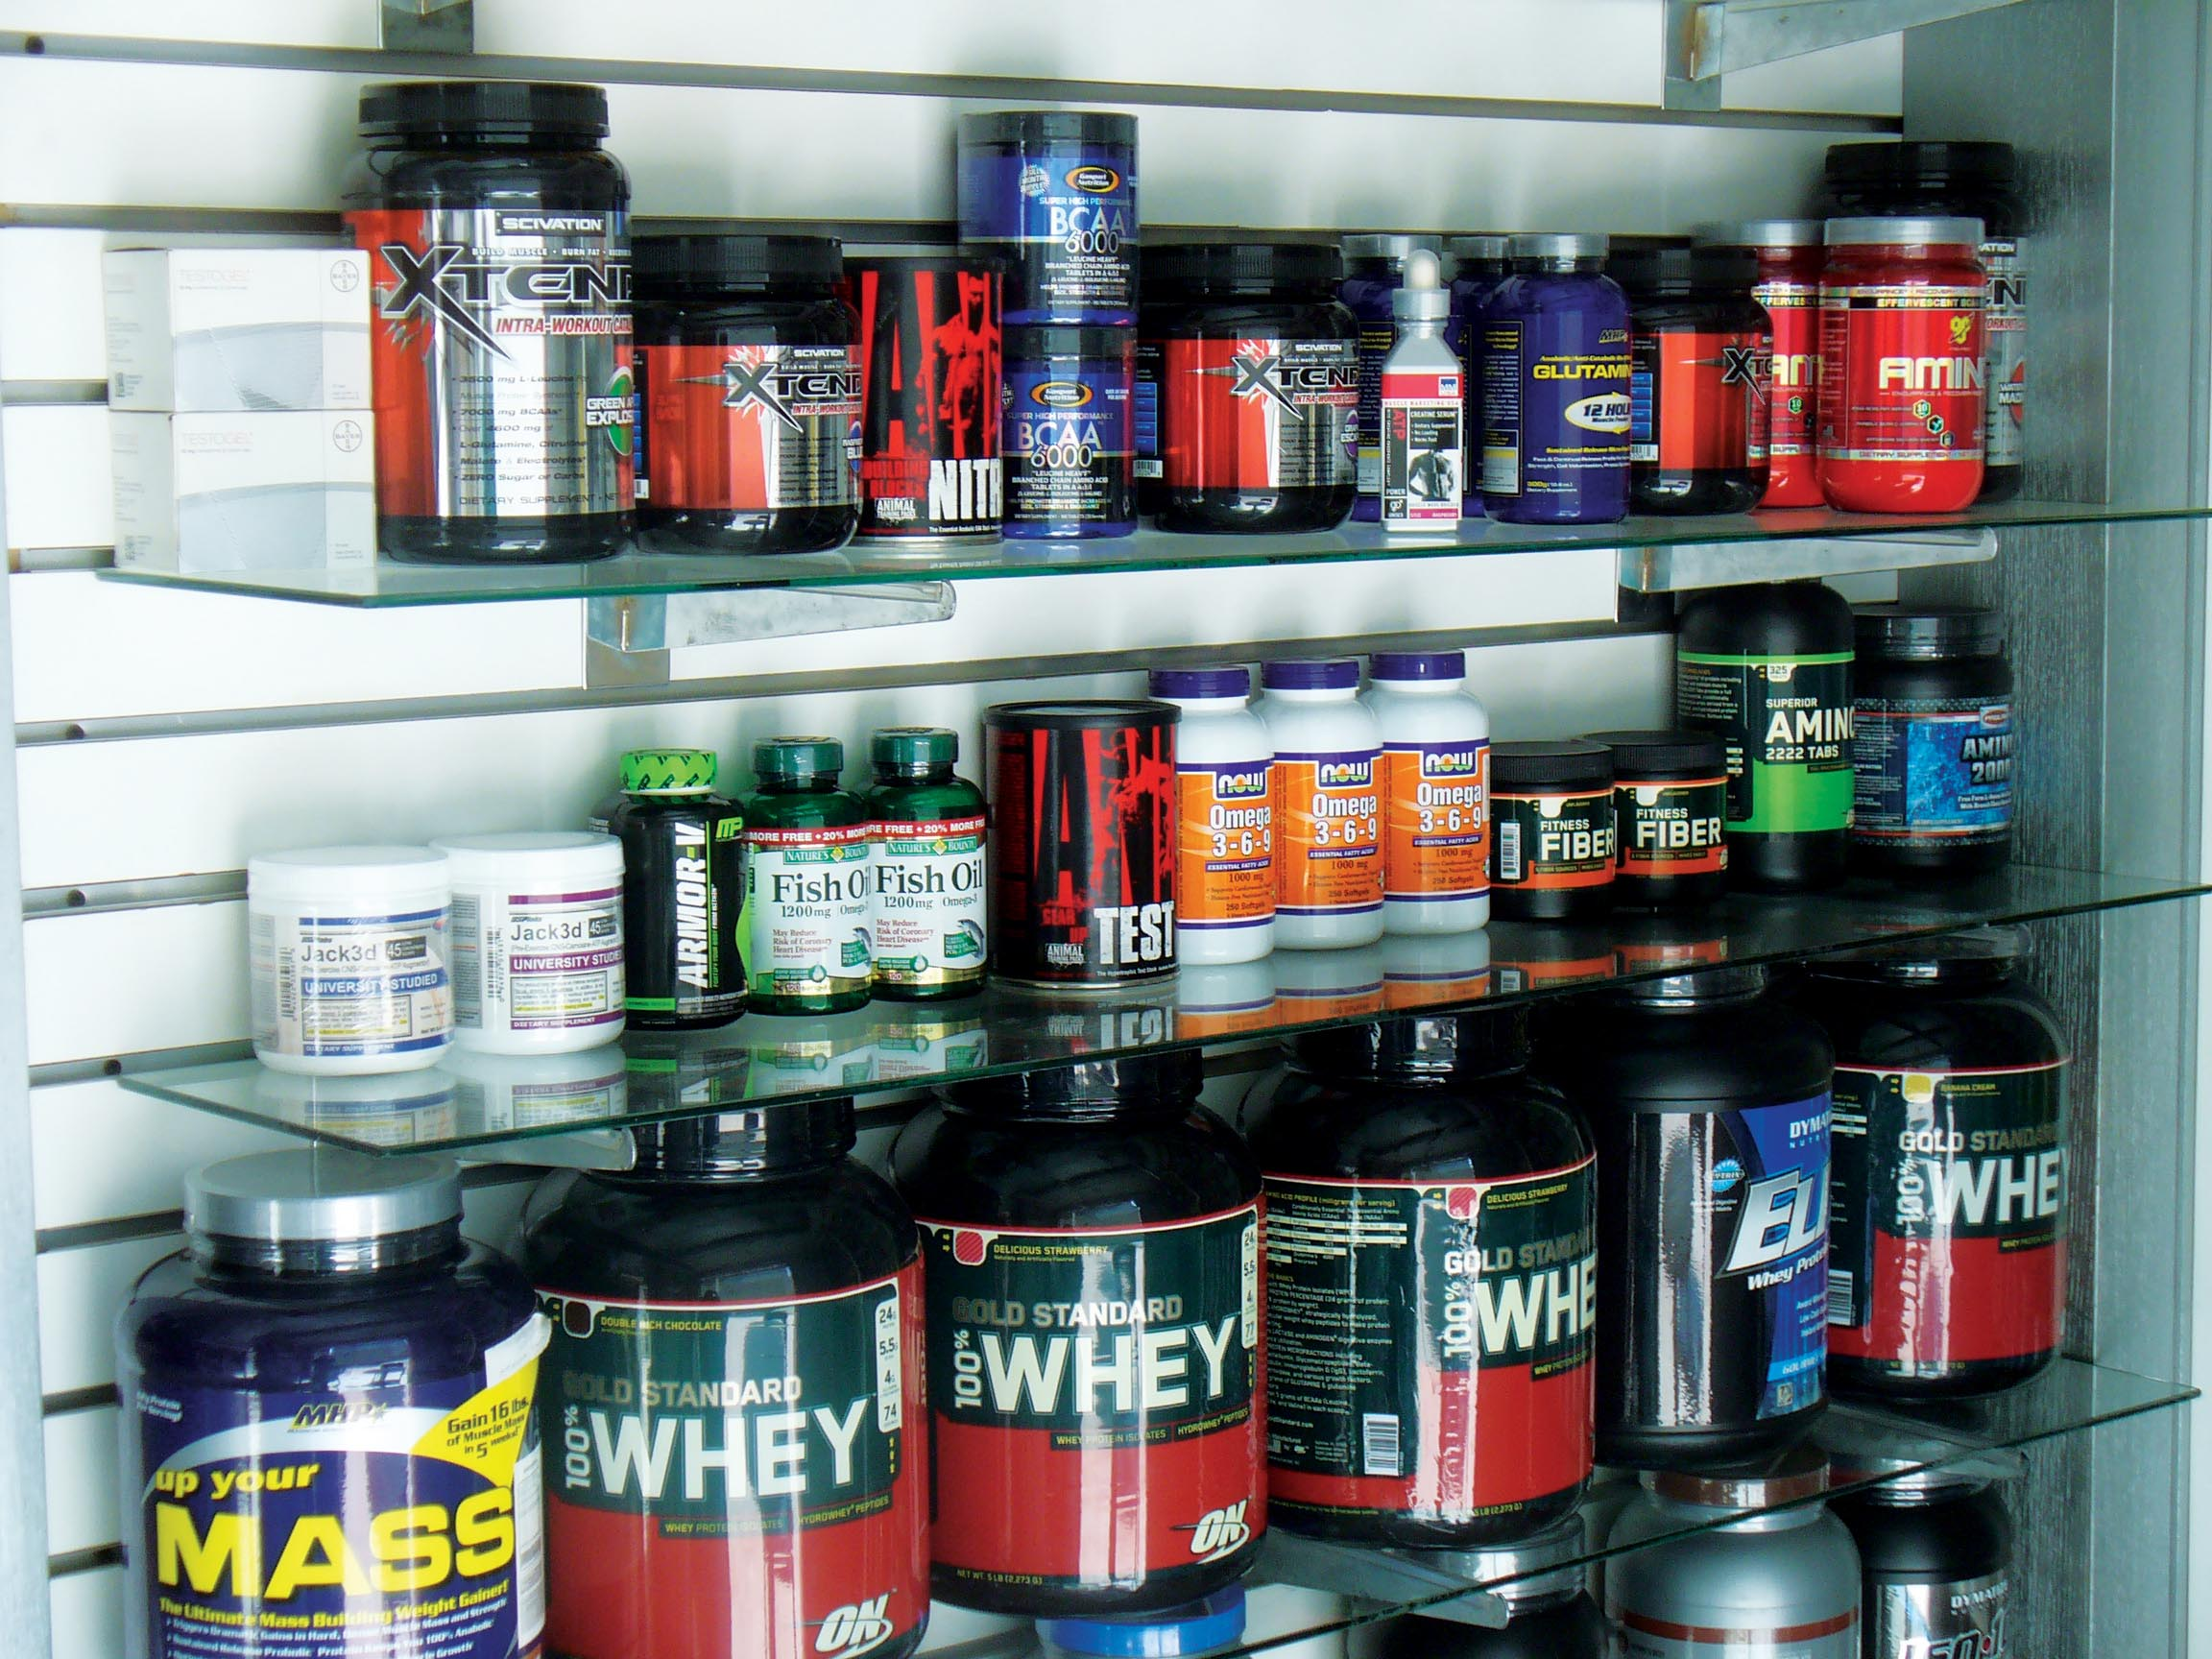 Os Melhores Suplementos Para Aumentar A Massa Muscular